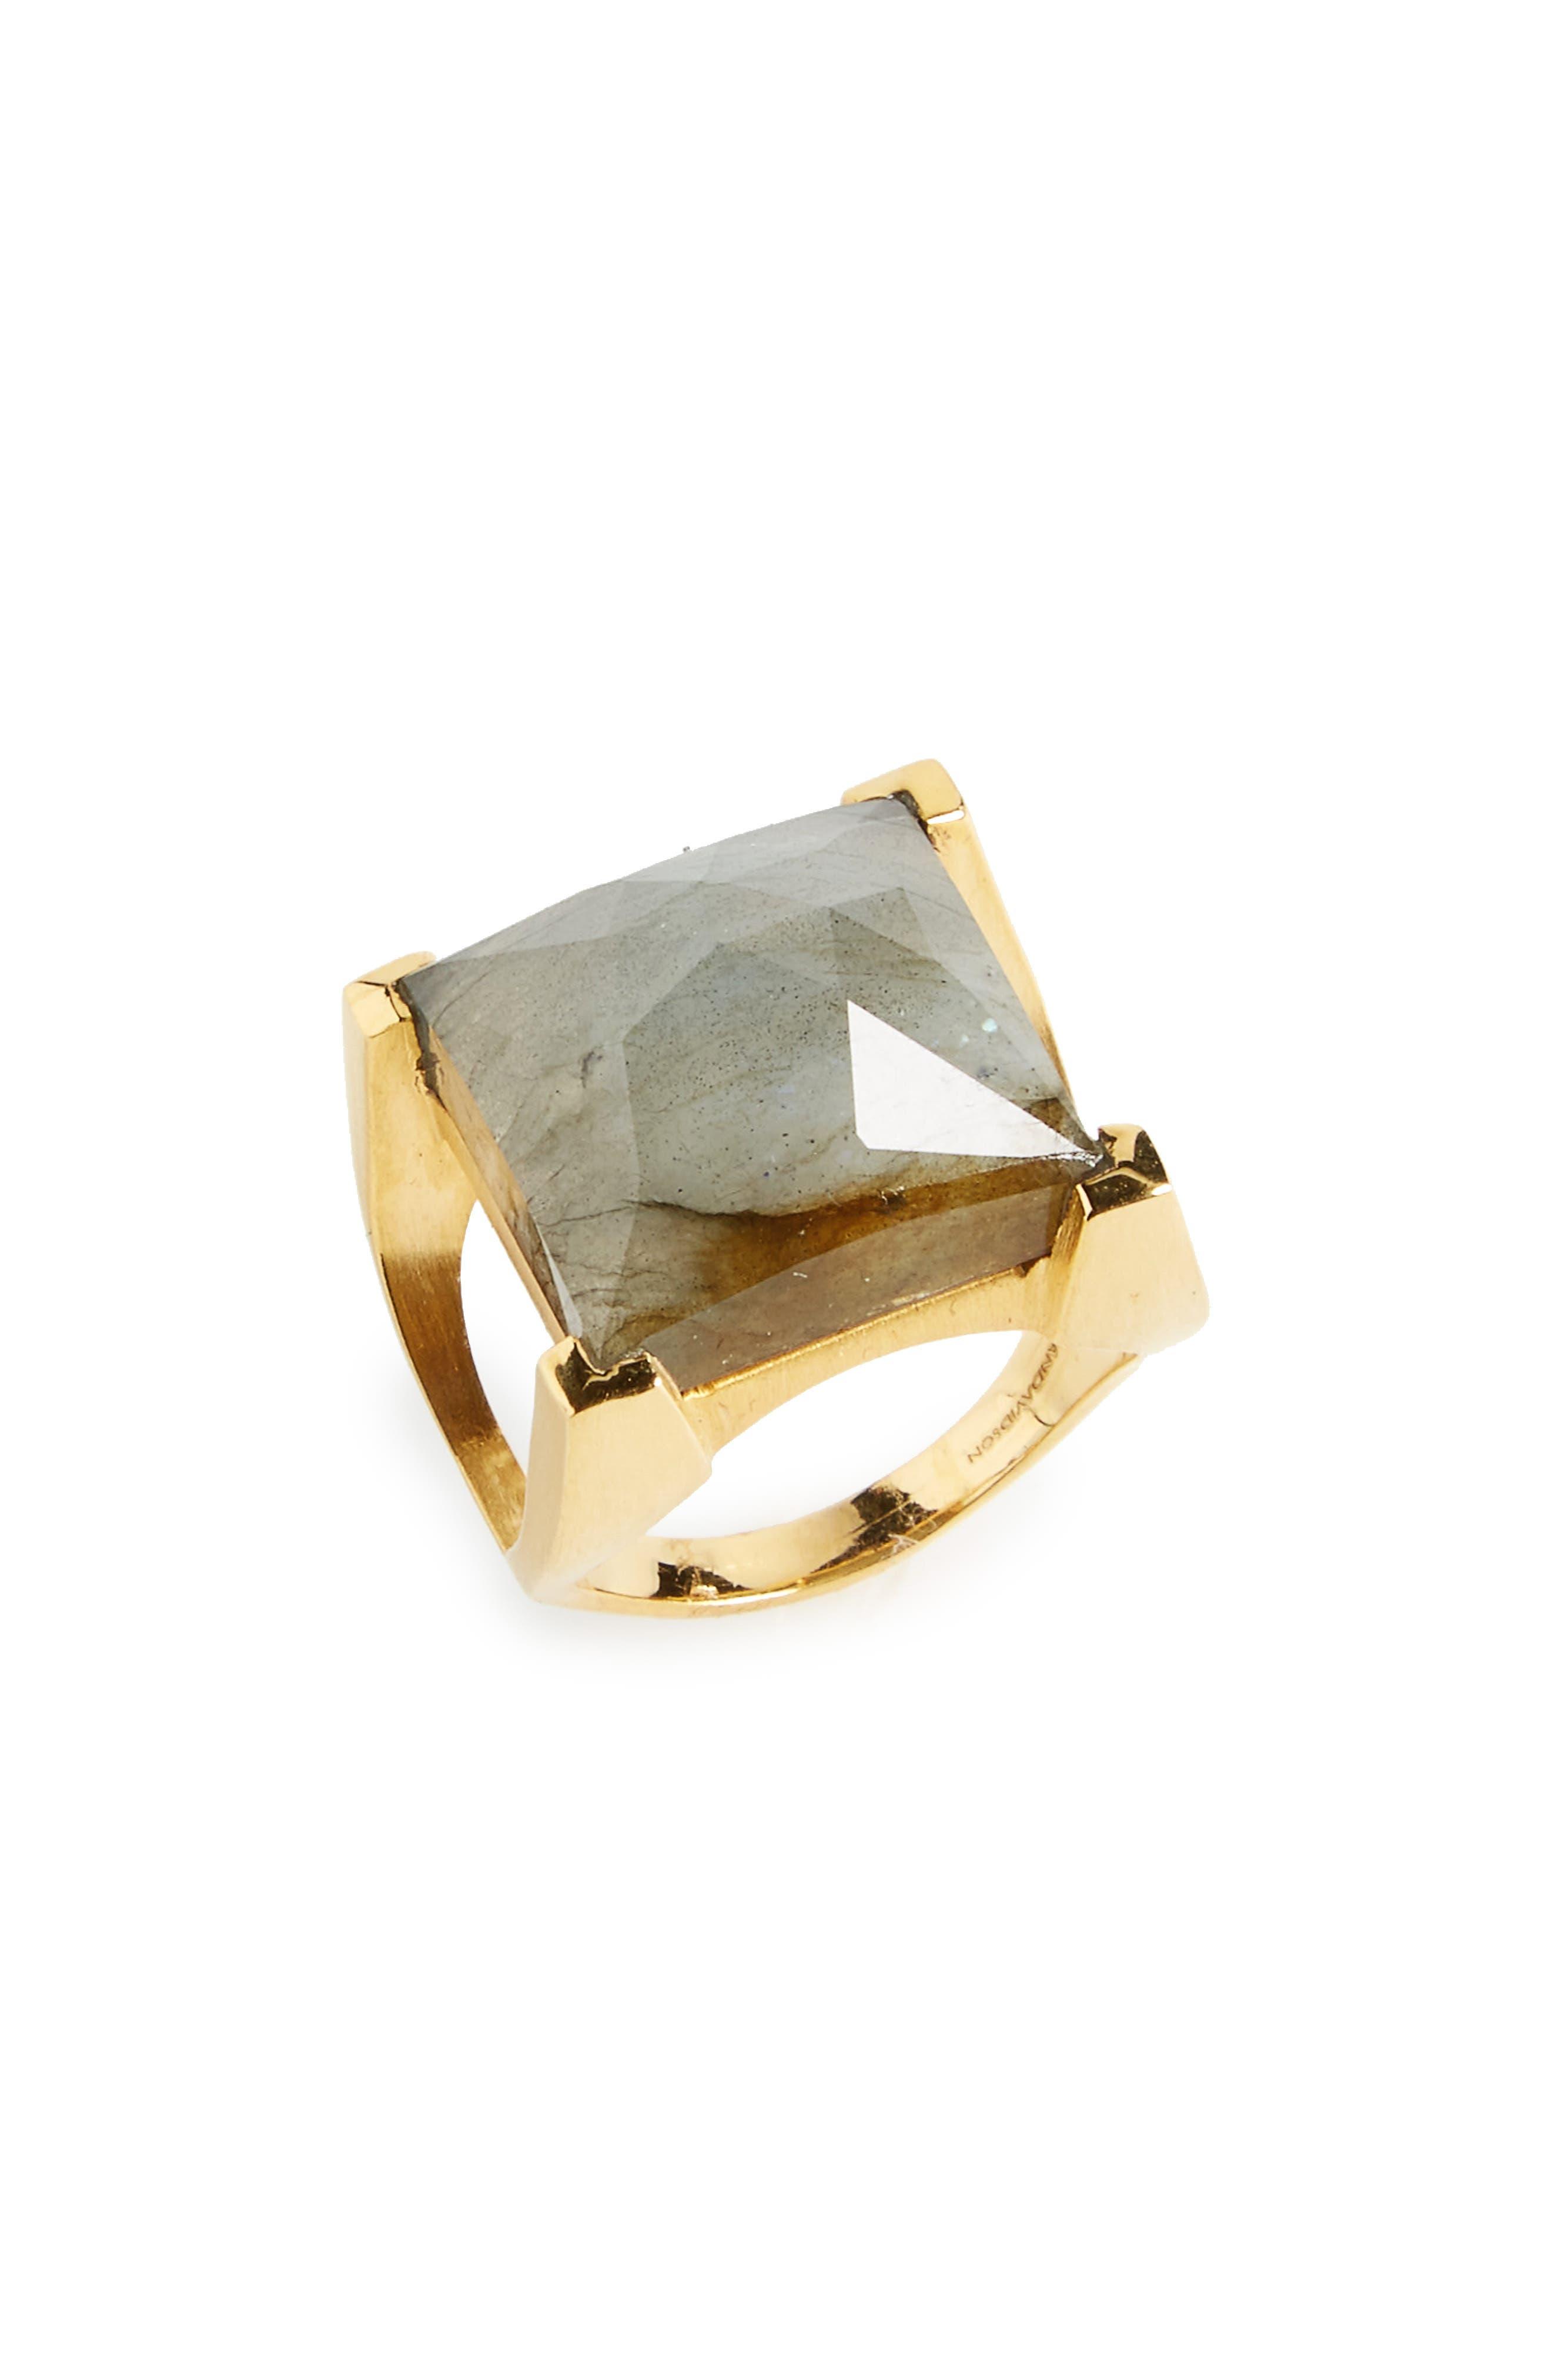 Main Image - Dean Davidson Semiprecious Stone Ring